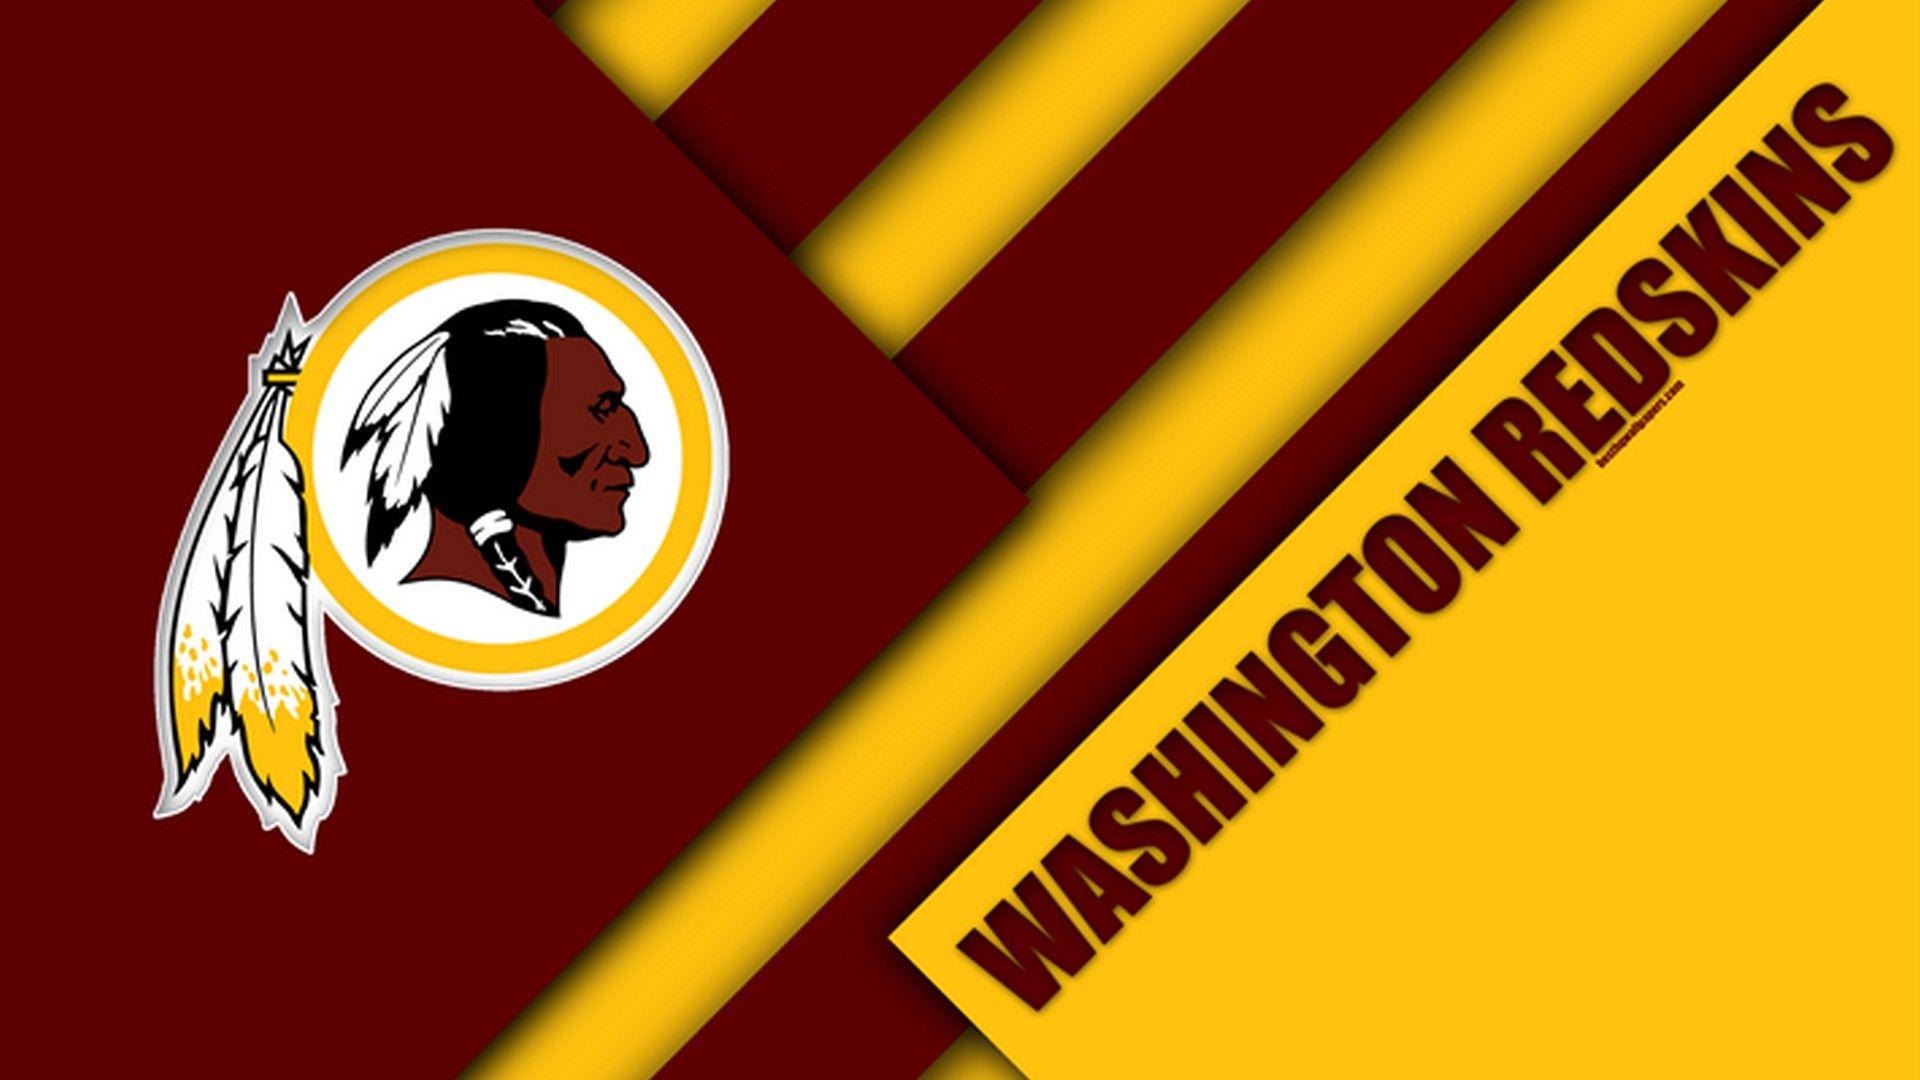 Washington Redskins Wallpaper Washington redskins, Nfl